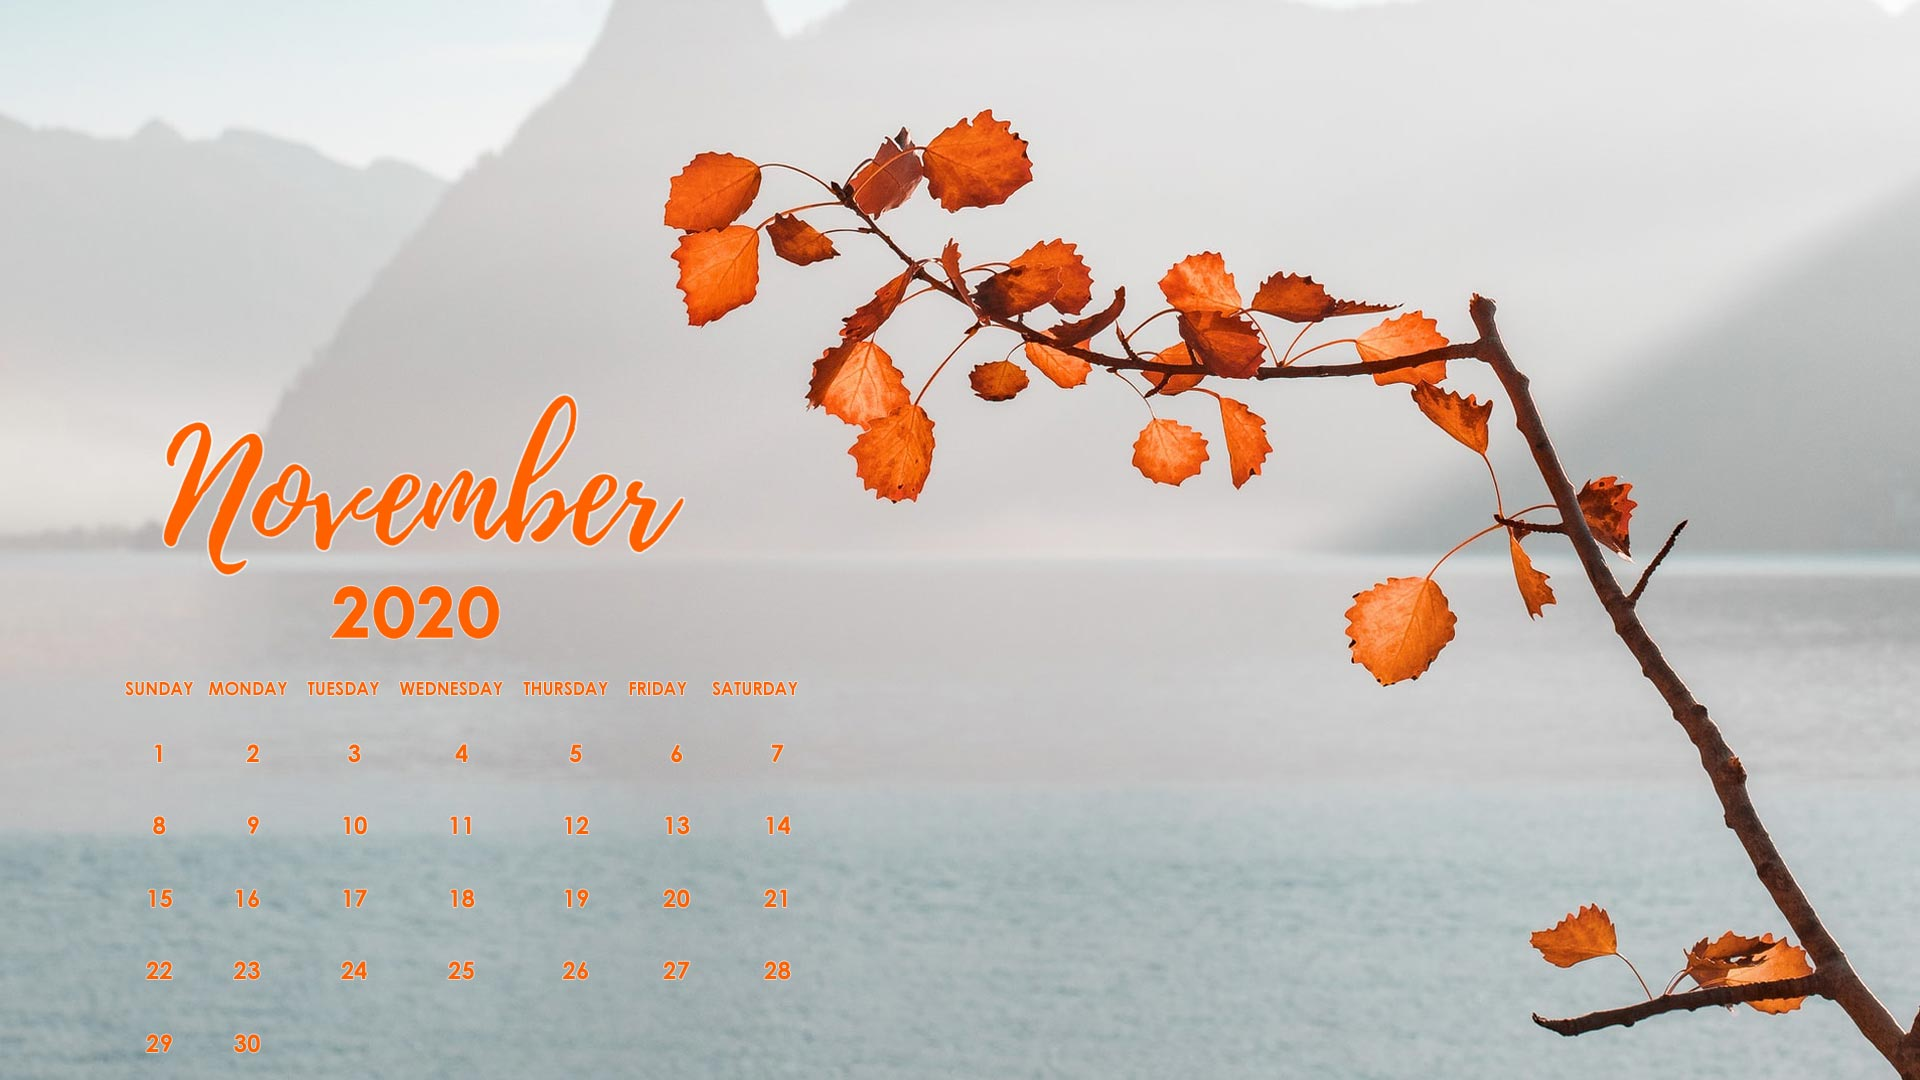 free november 2020 wallpaper desktop laptop